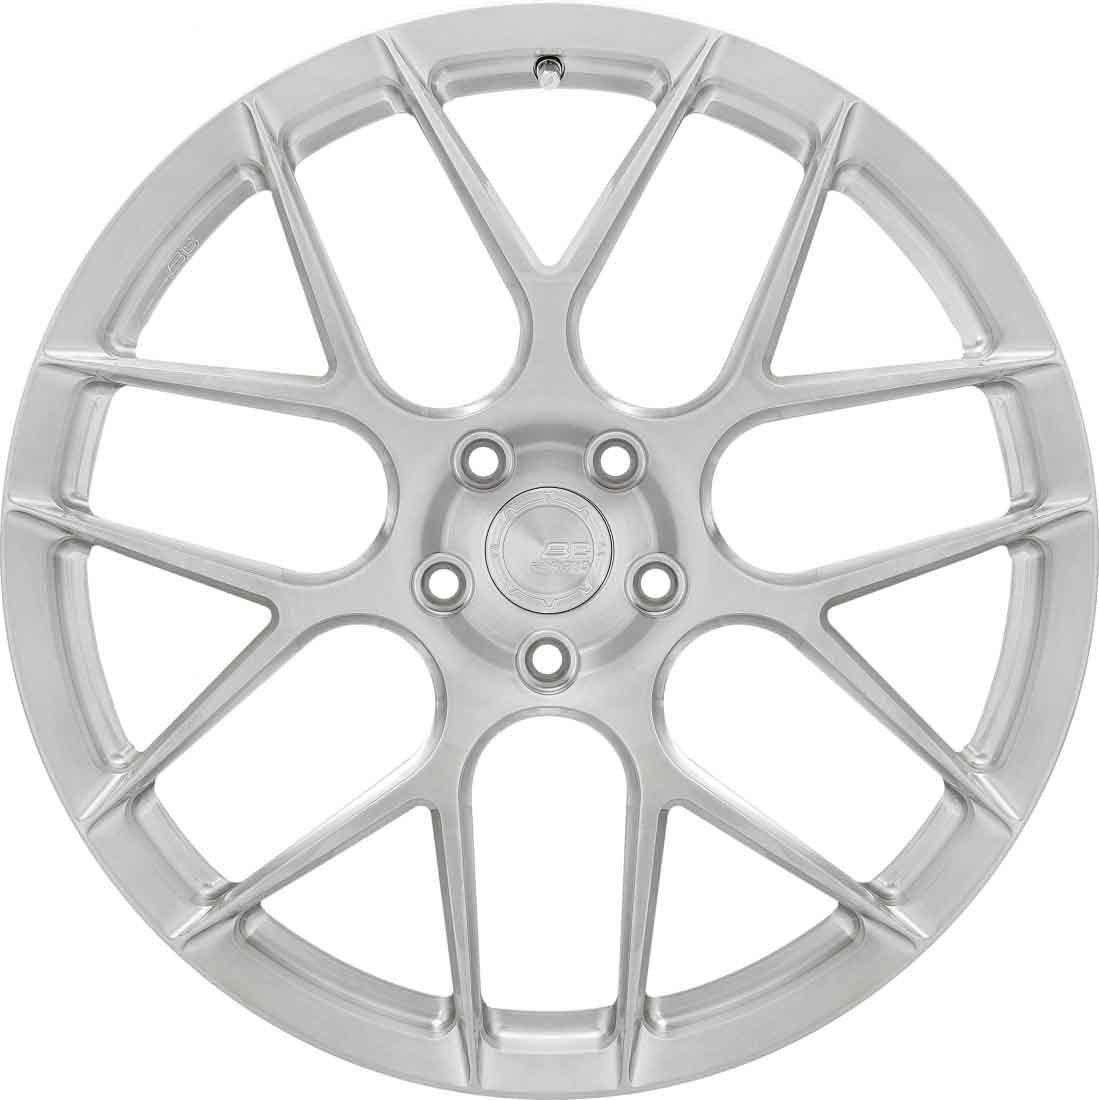 BC Forged wheels KL12 (KL Series)